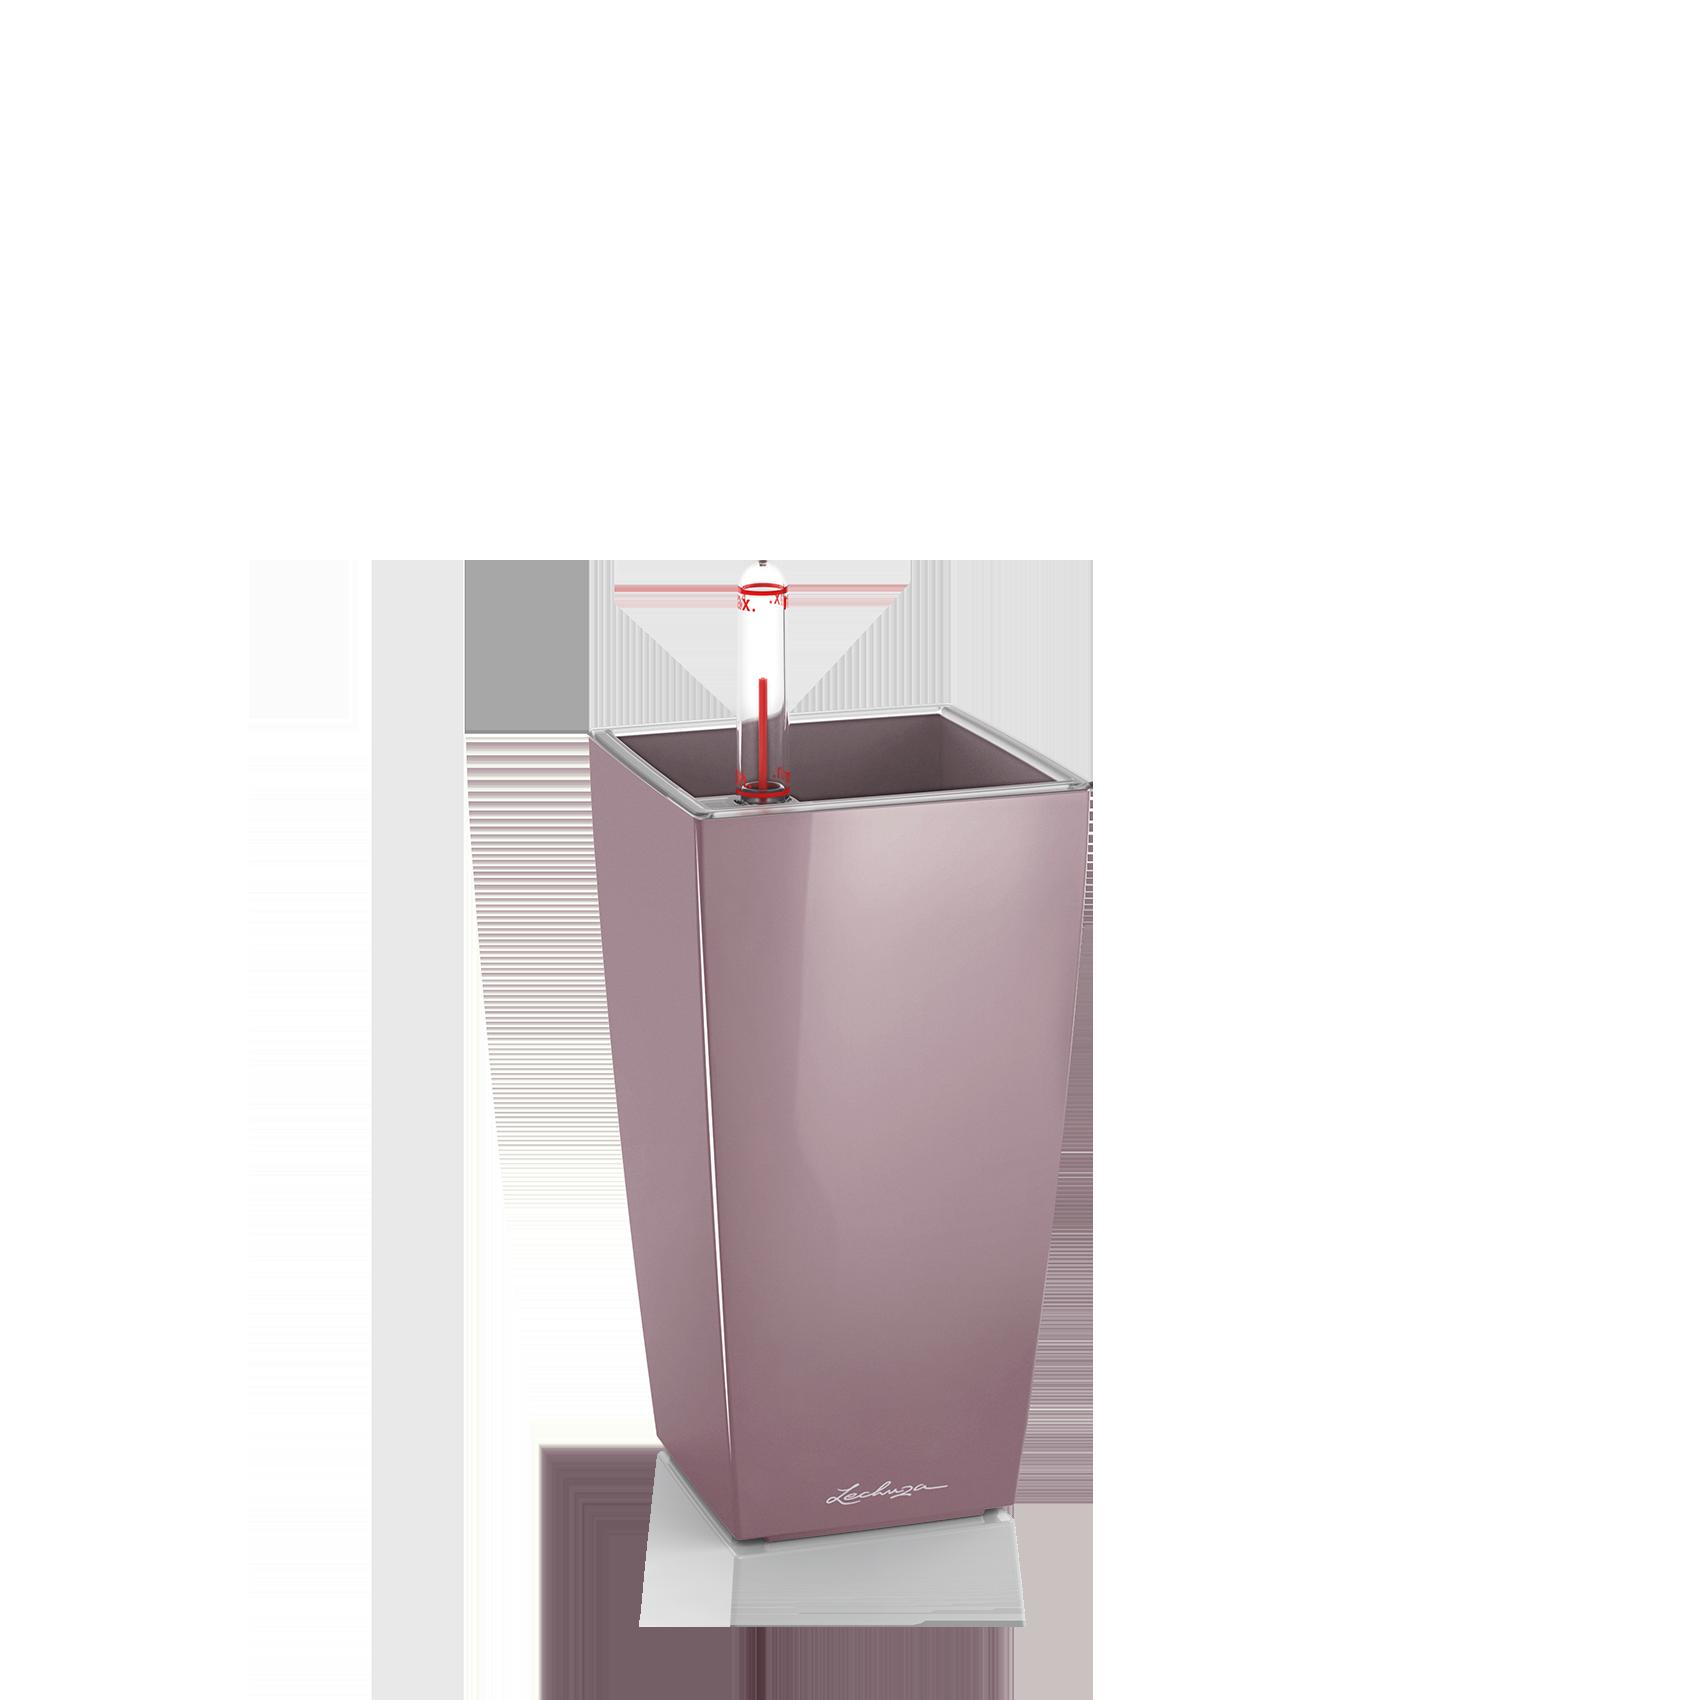 MINI-CUBI pastellviolett hochglanz